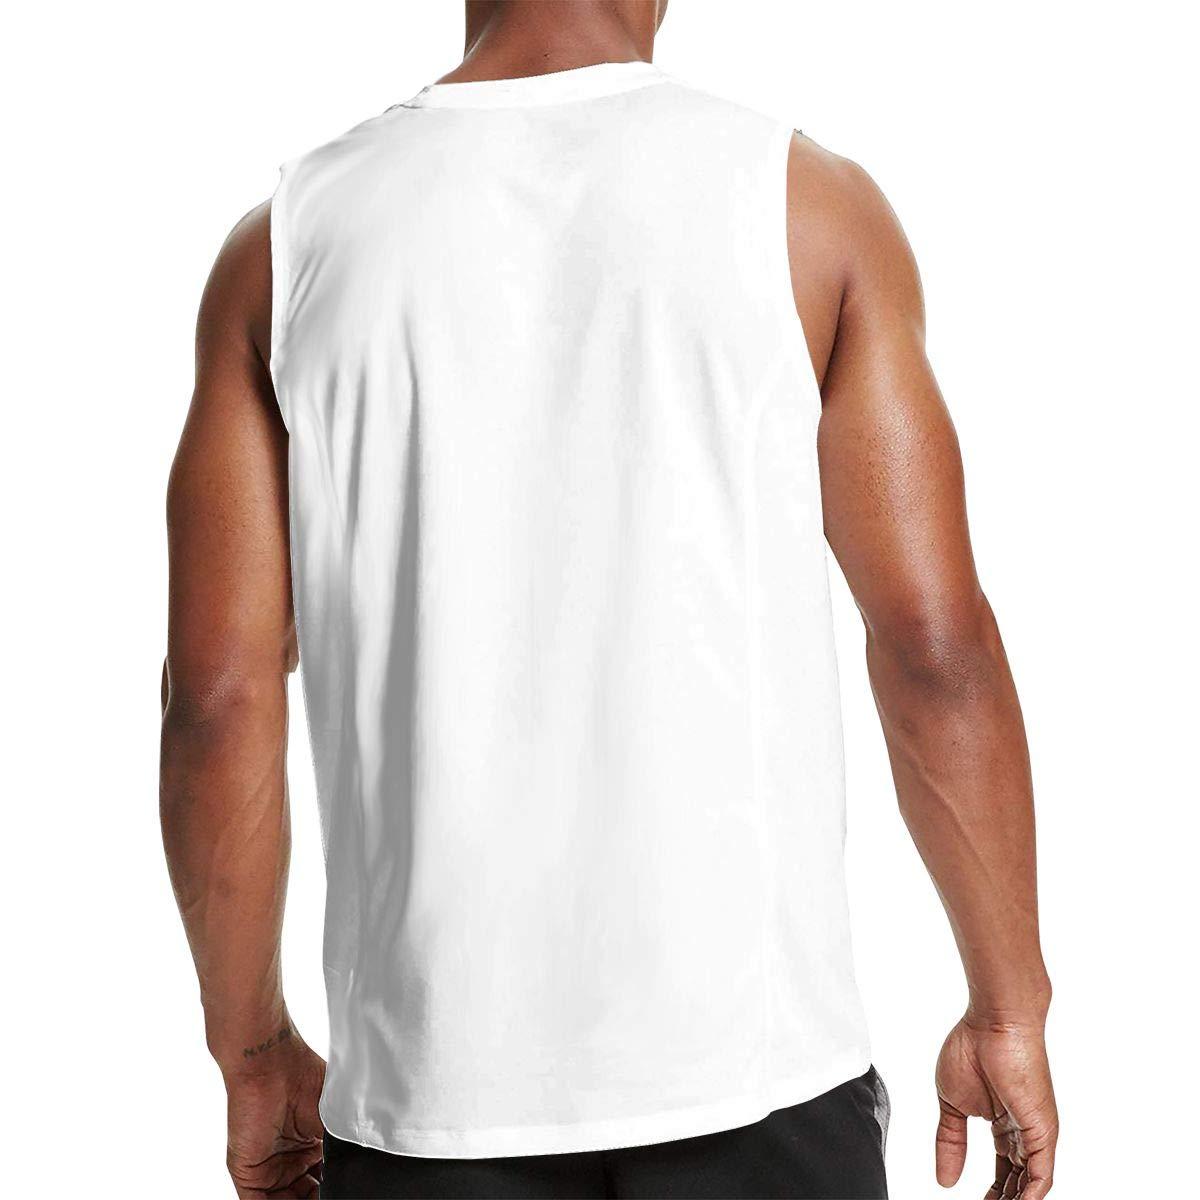 Mens Casual Sleeveless T-Shirt Cotton Short-Sleeve Tank DFGHJZH-L Escape Velocity Printed